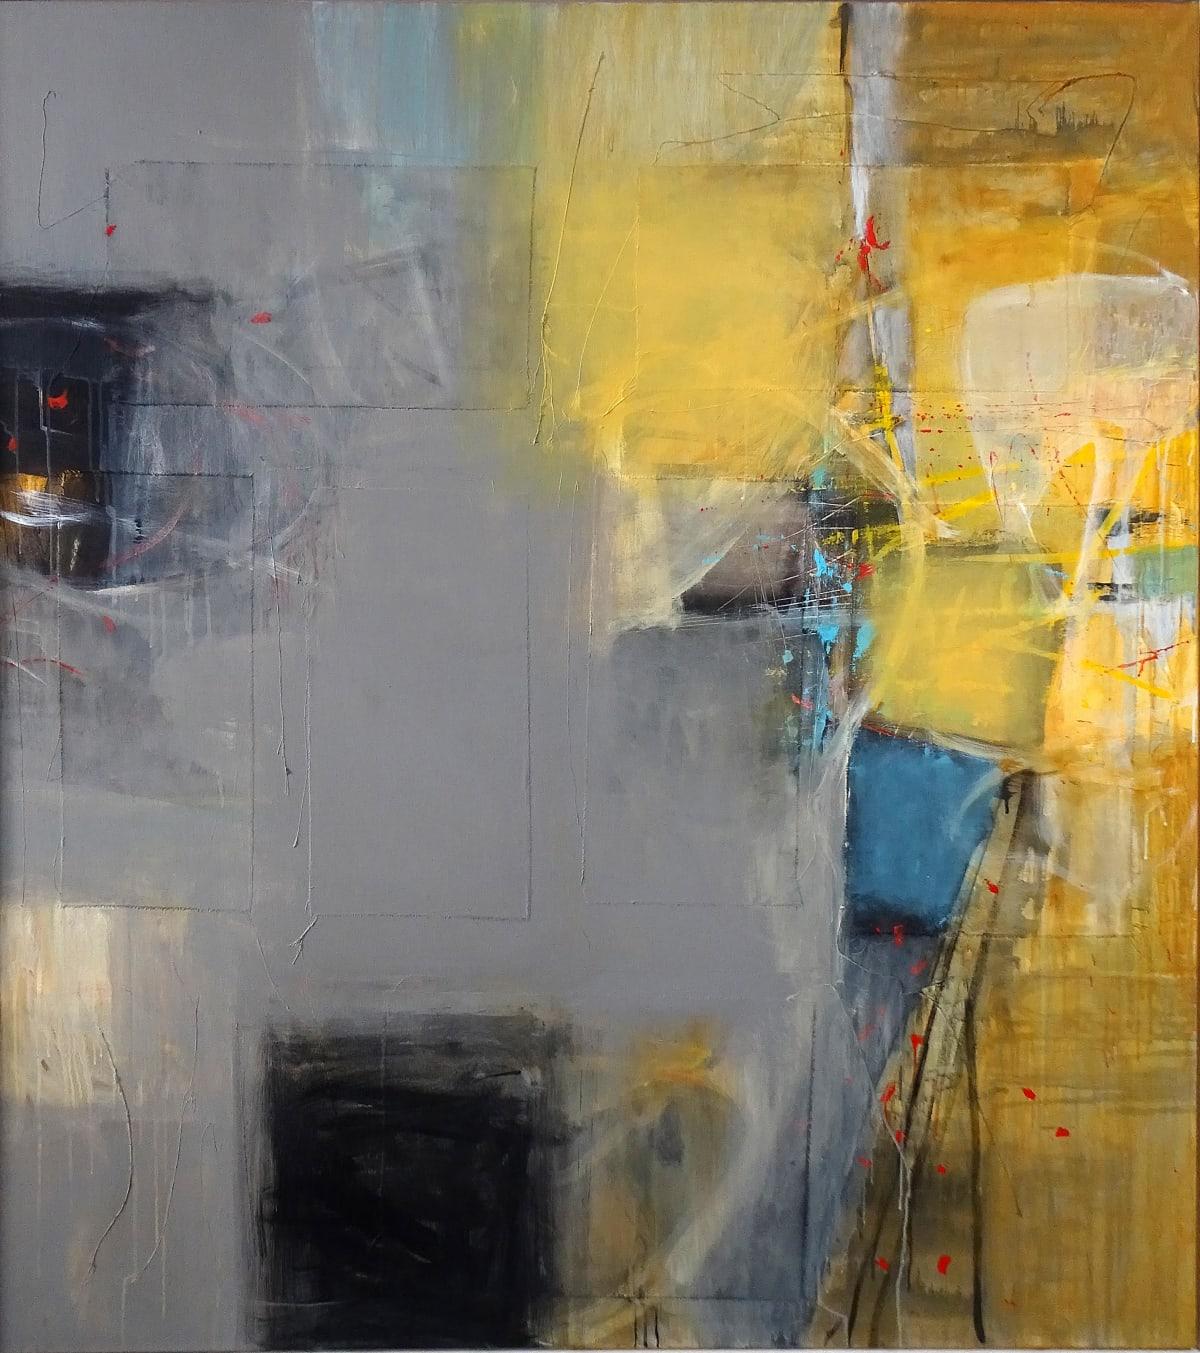 Martyn Brewster, Autumn Light, 2017